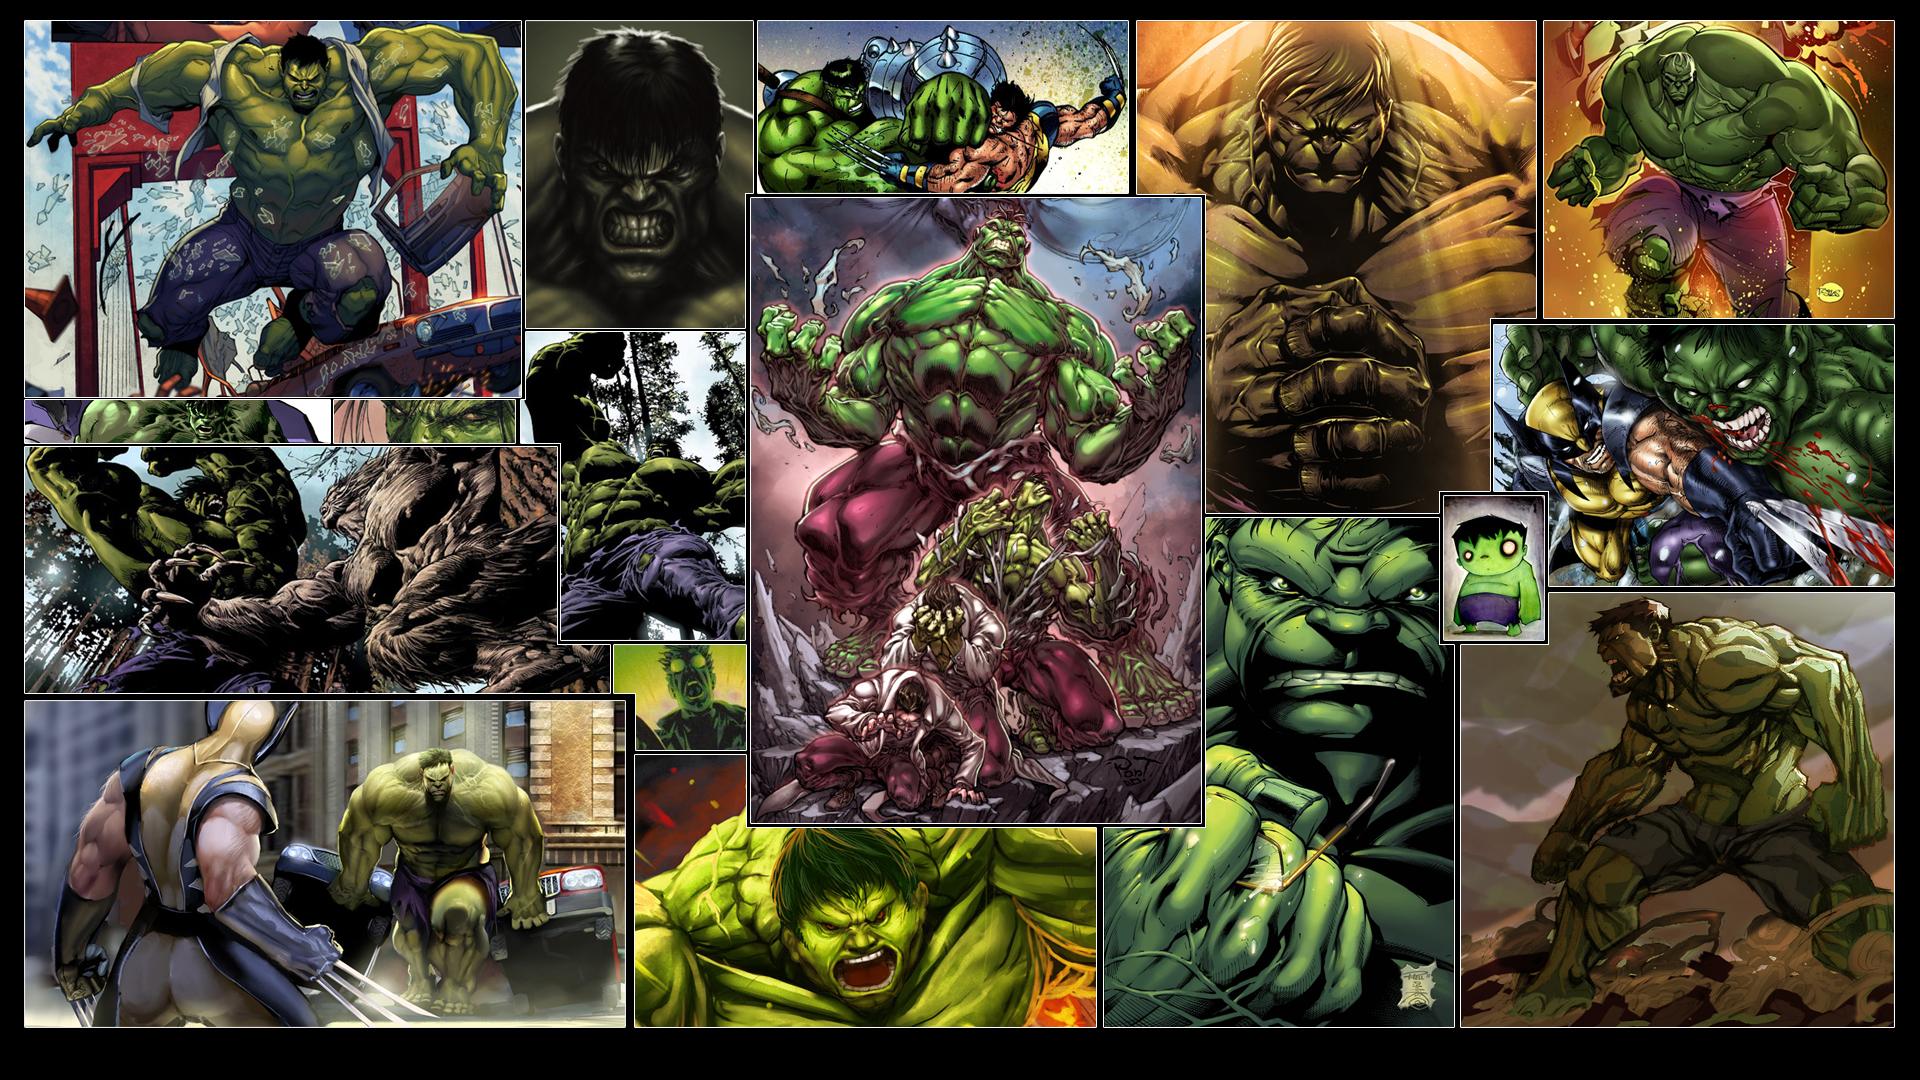 hulk_wallpaper_by_gt_orphan-d4vgxex.jpg